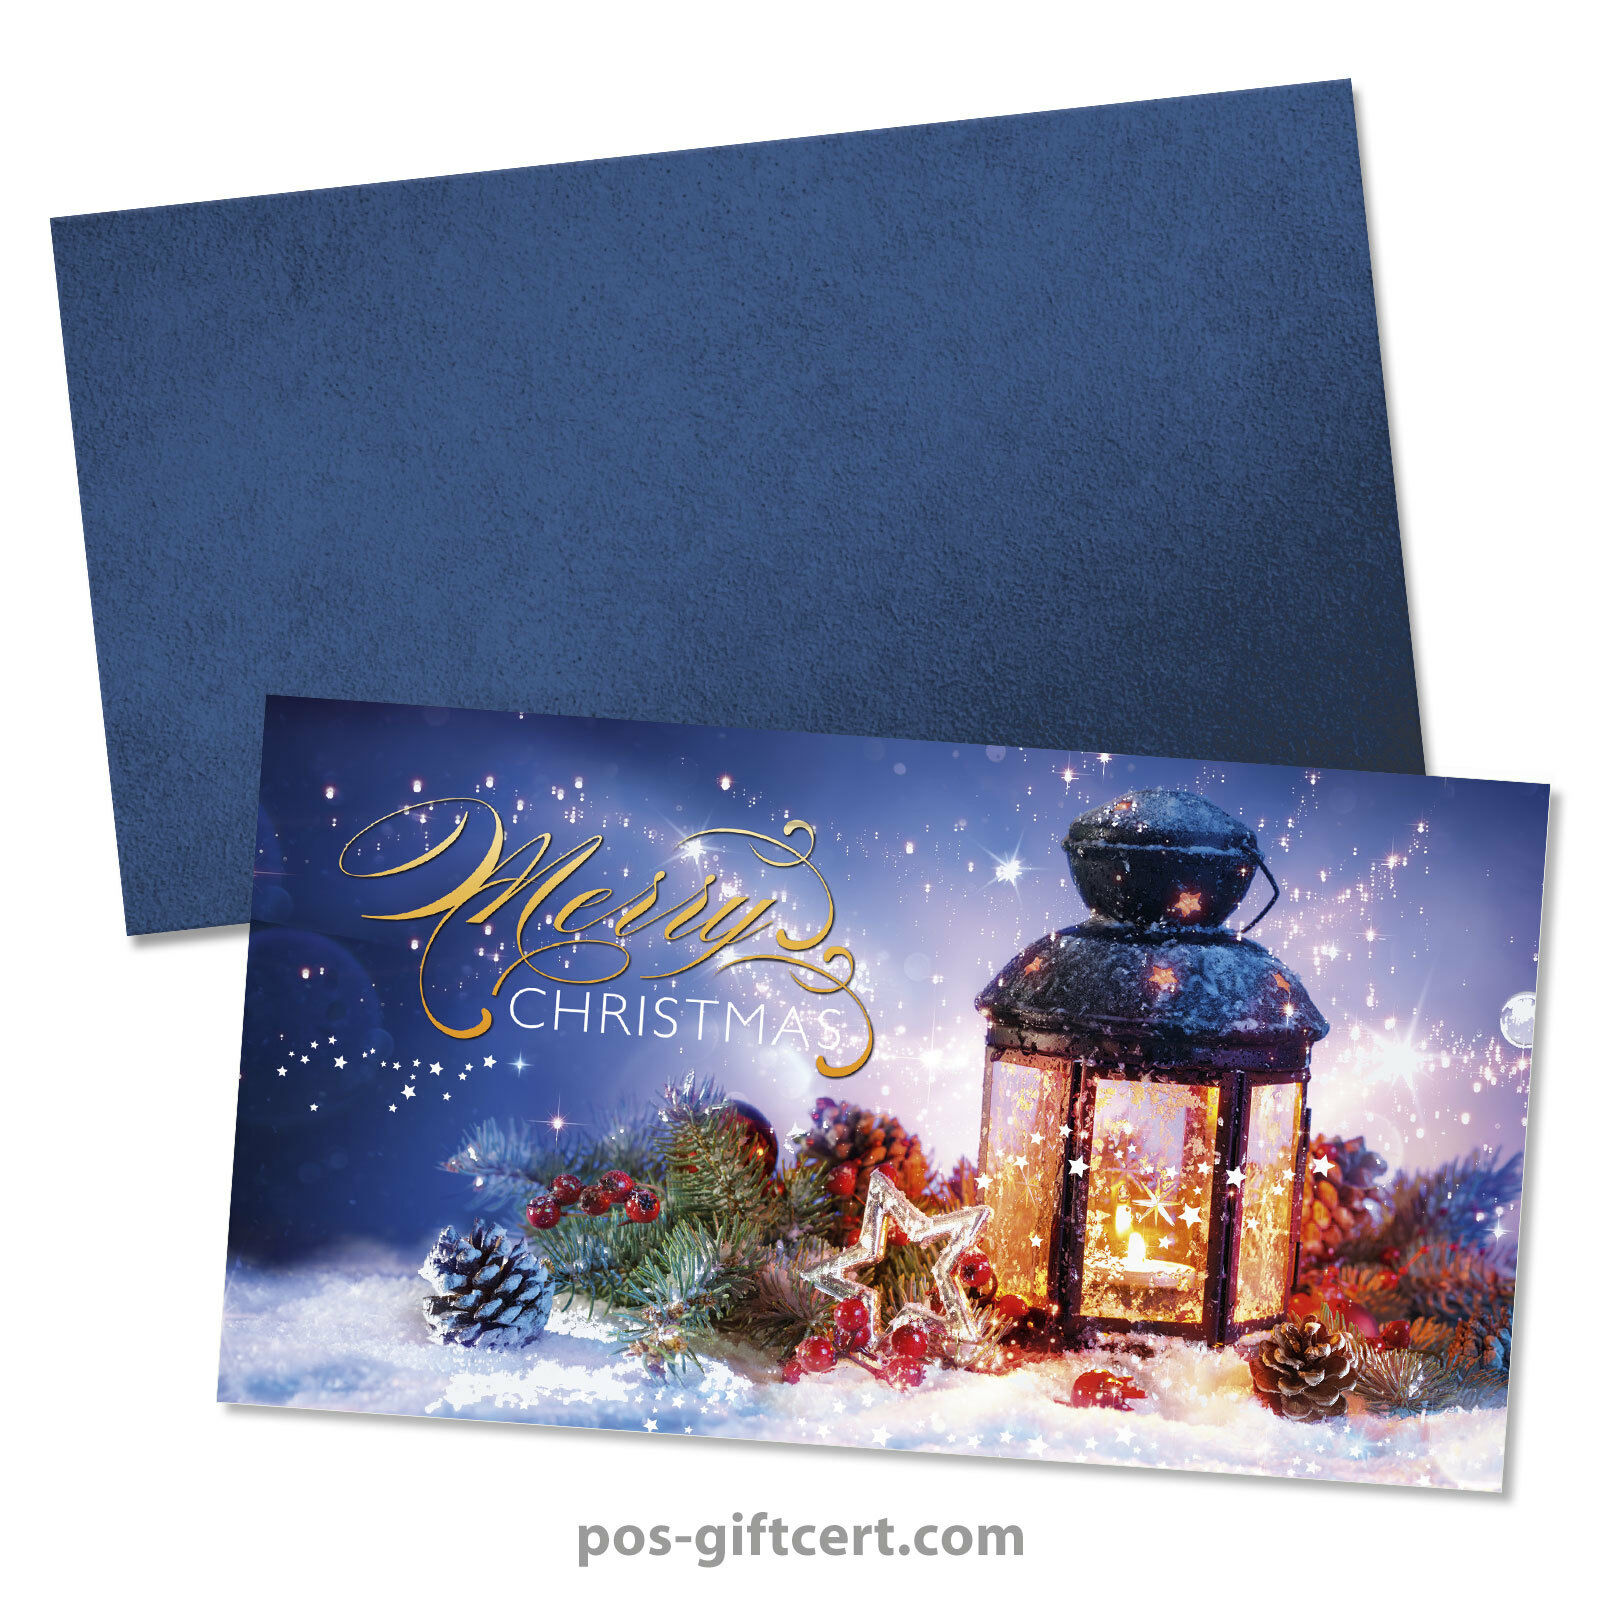 Gift vouchers + envelopes for christmas X1299GB